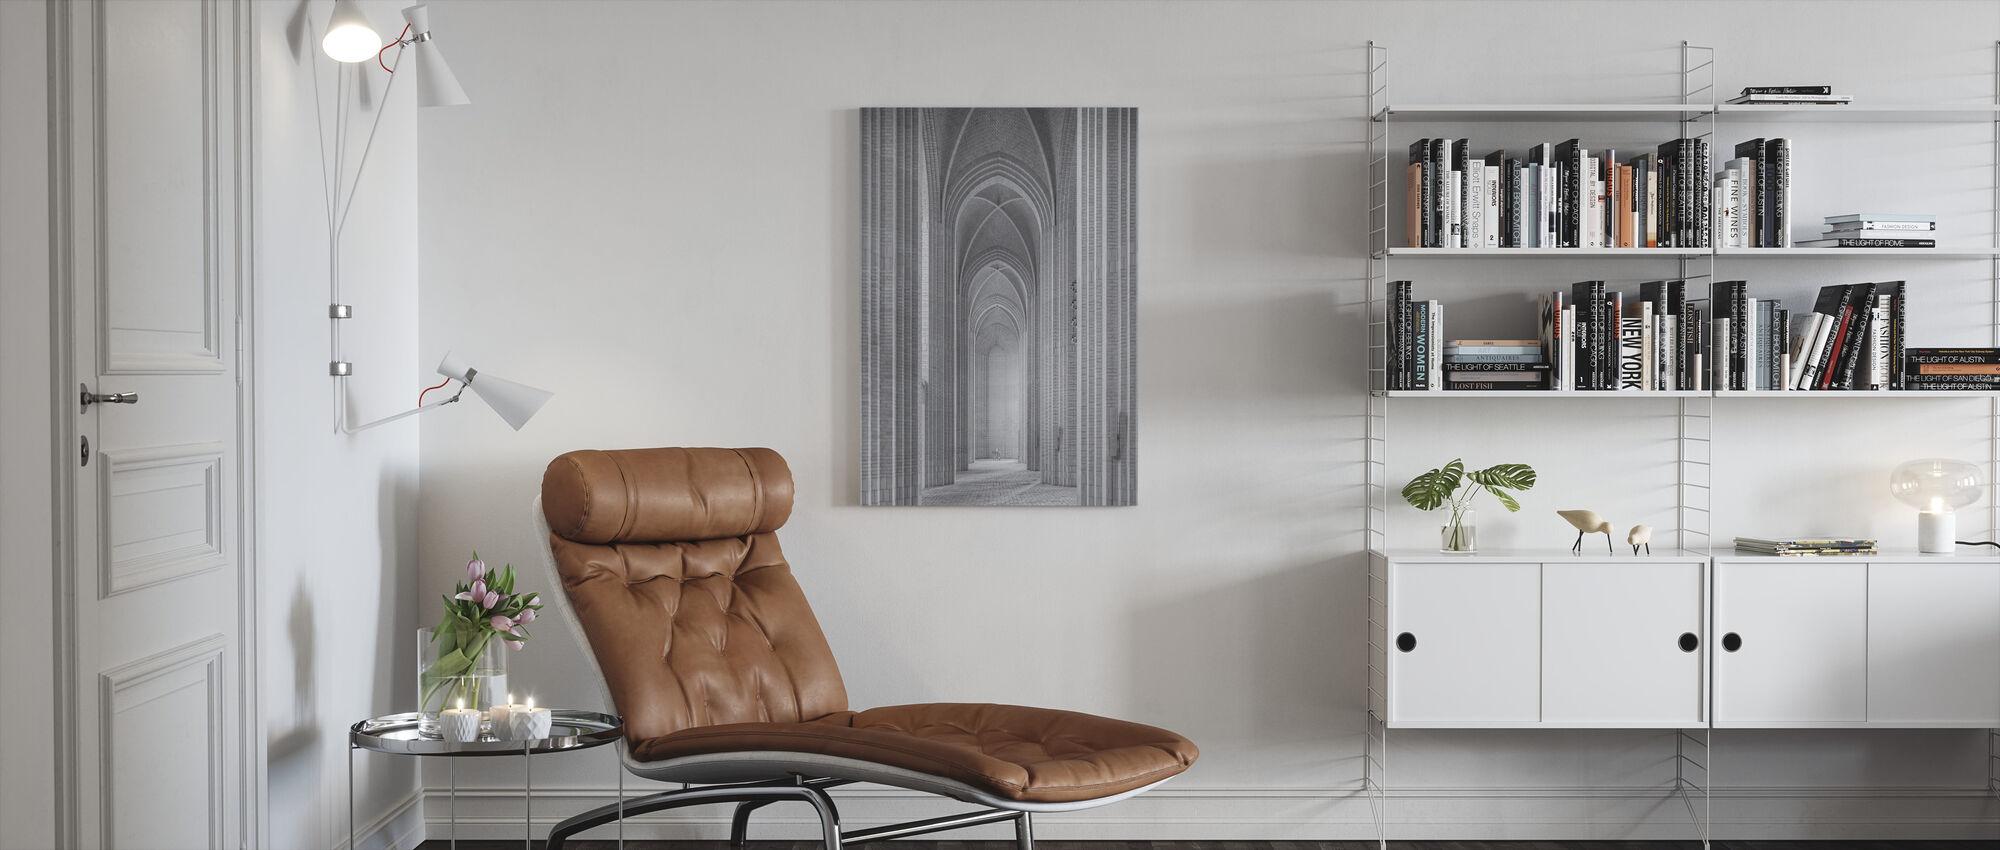 Grundtvig-kerk - Canvas print - Woonkamer